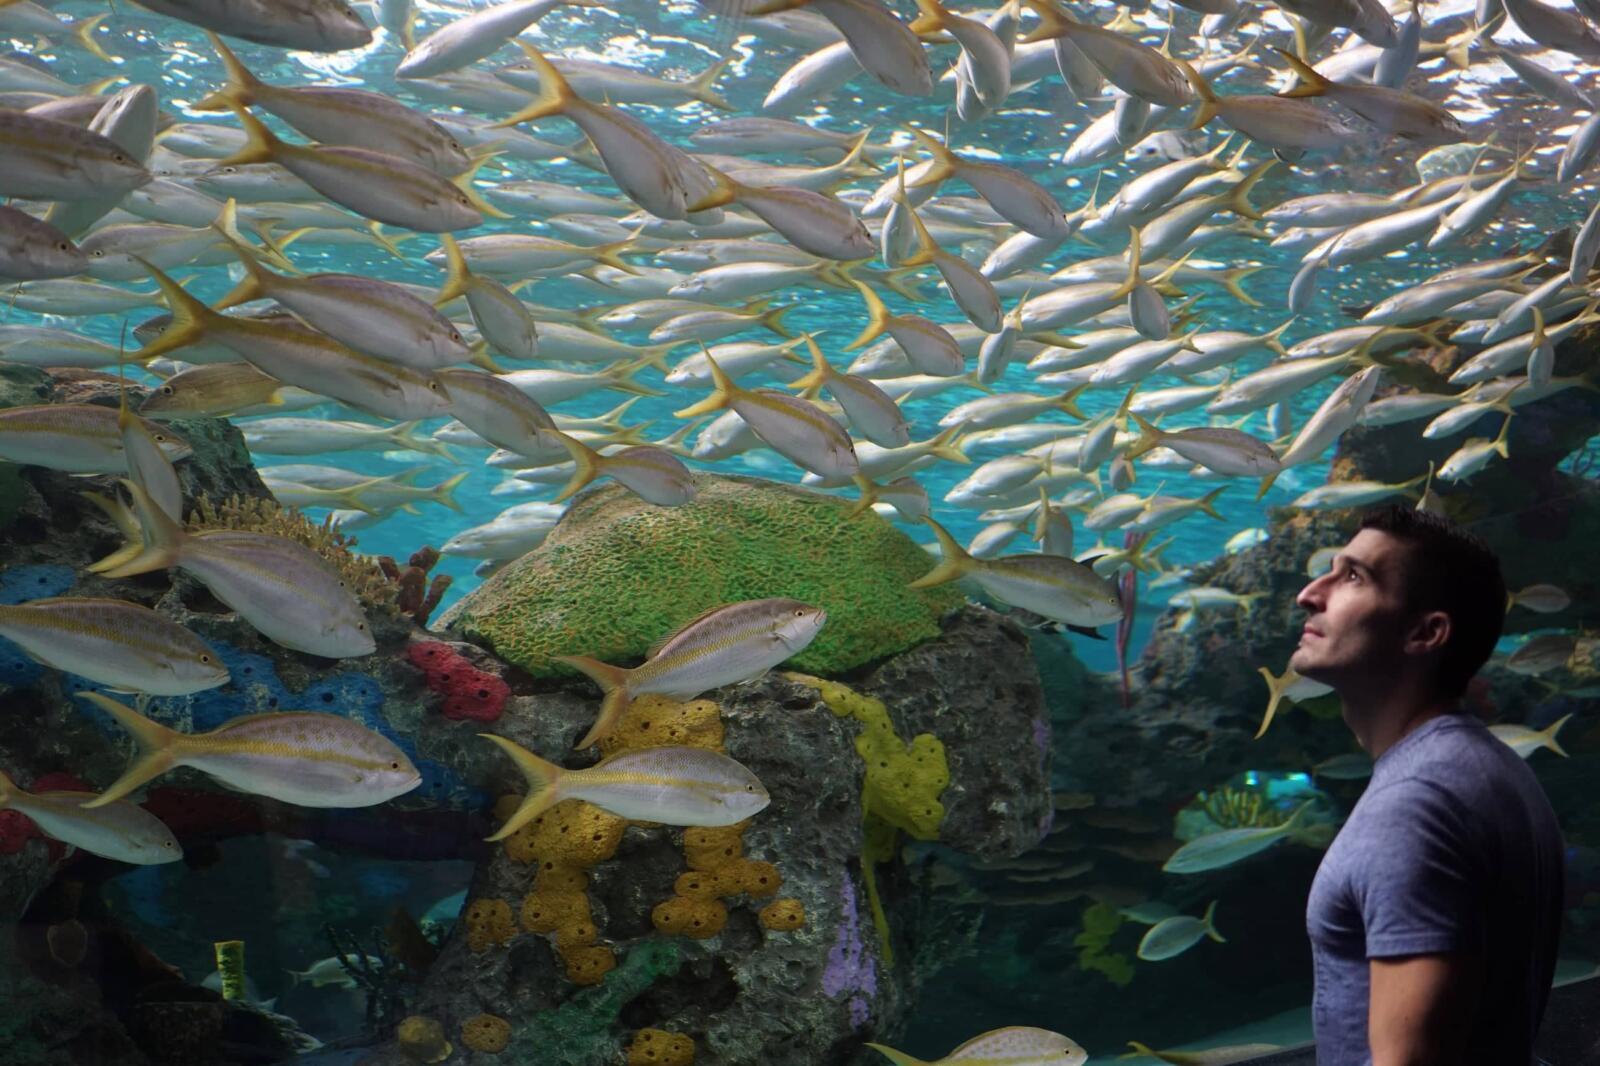 aquarium one of best romantic things to do in Toronto